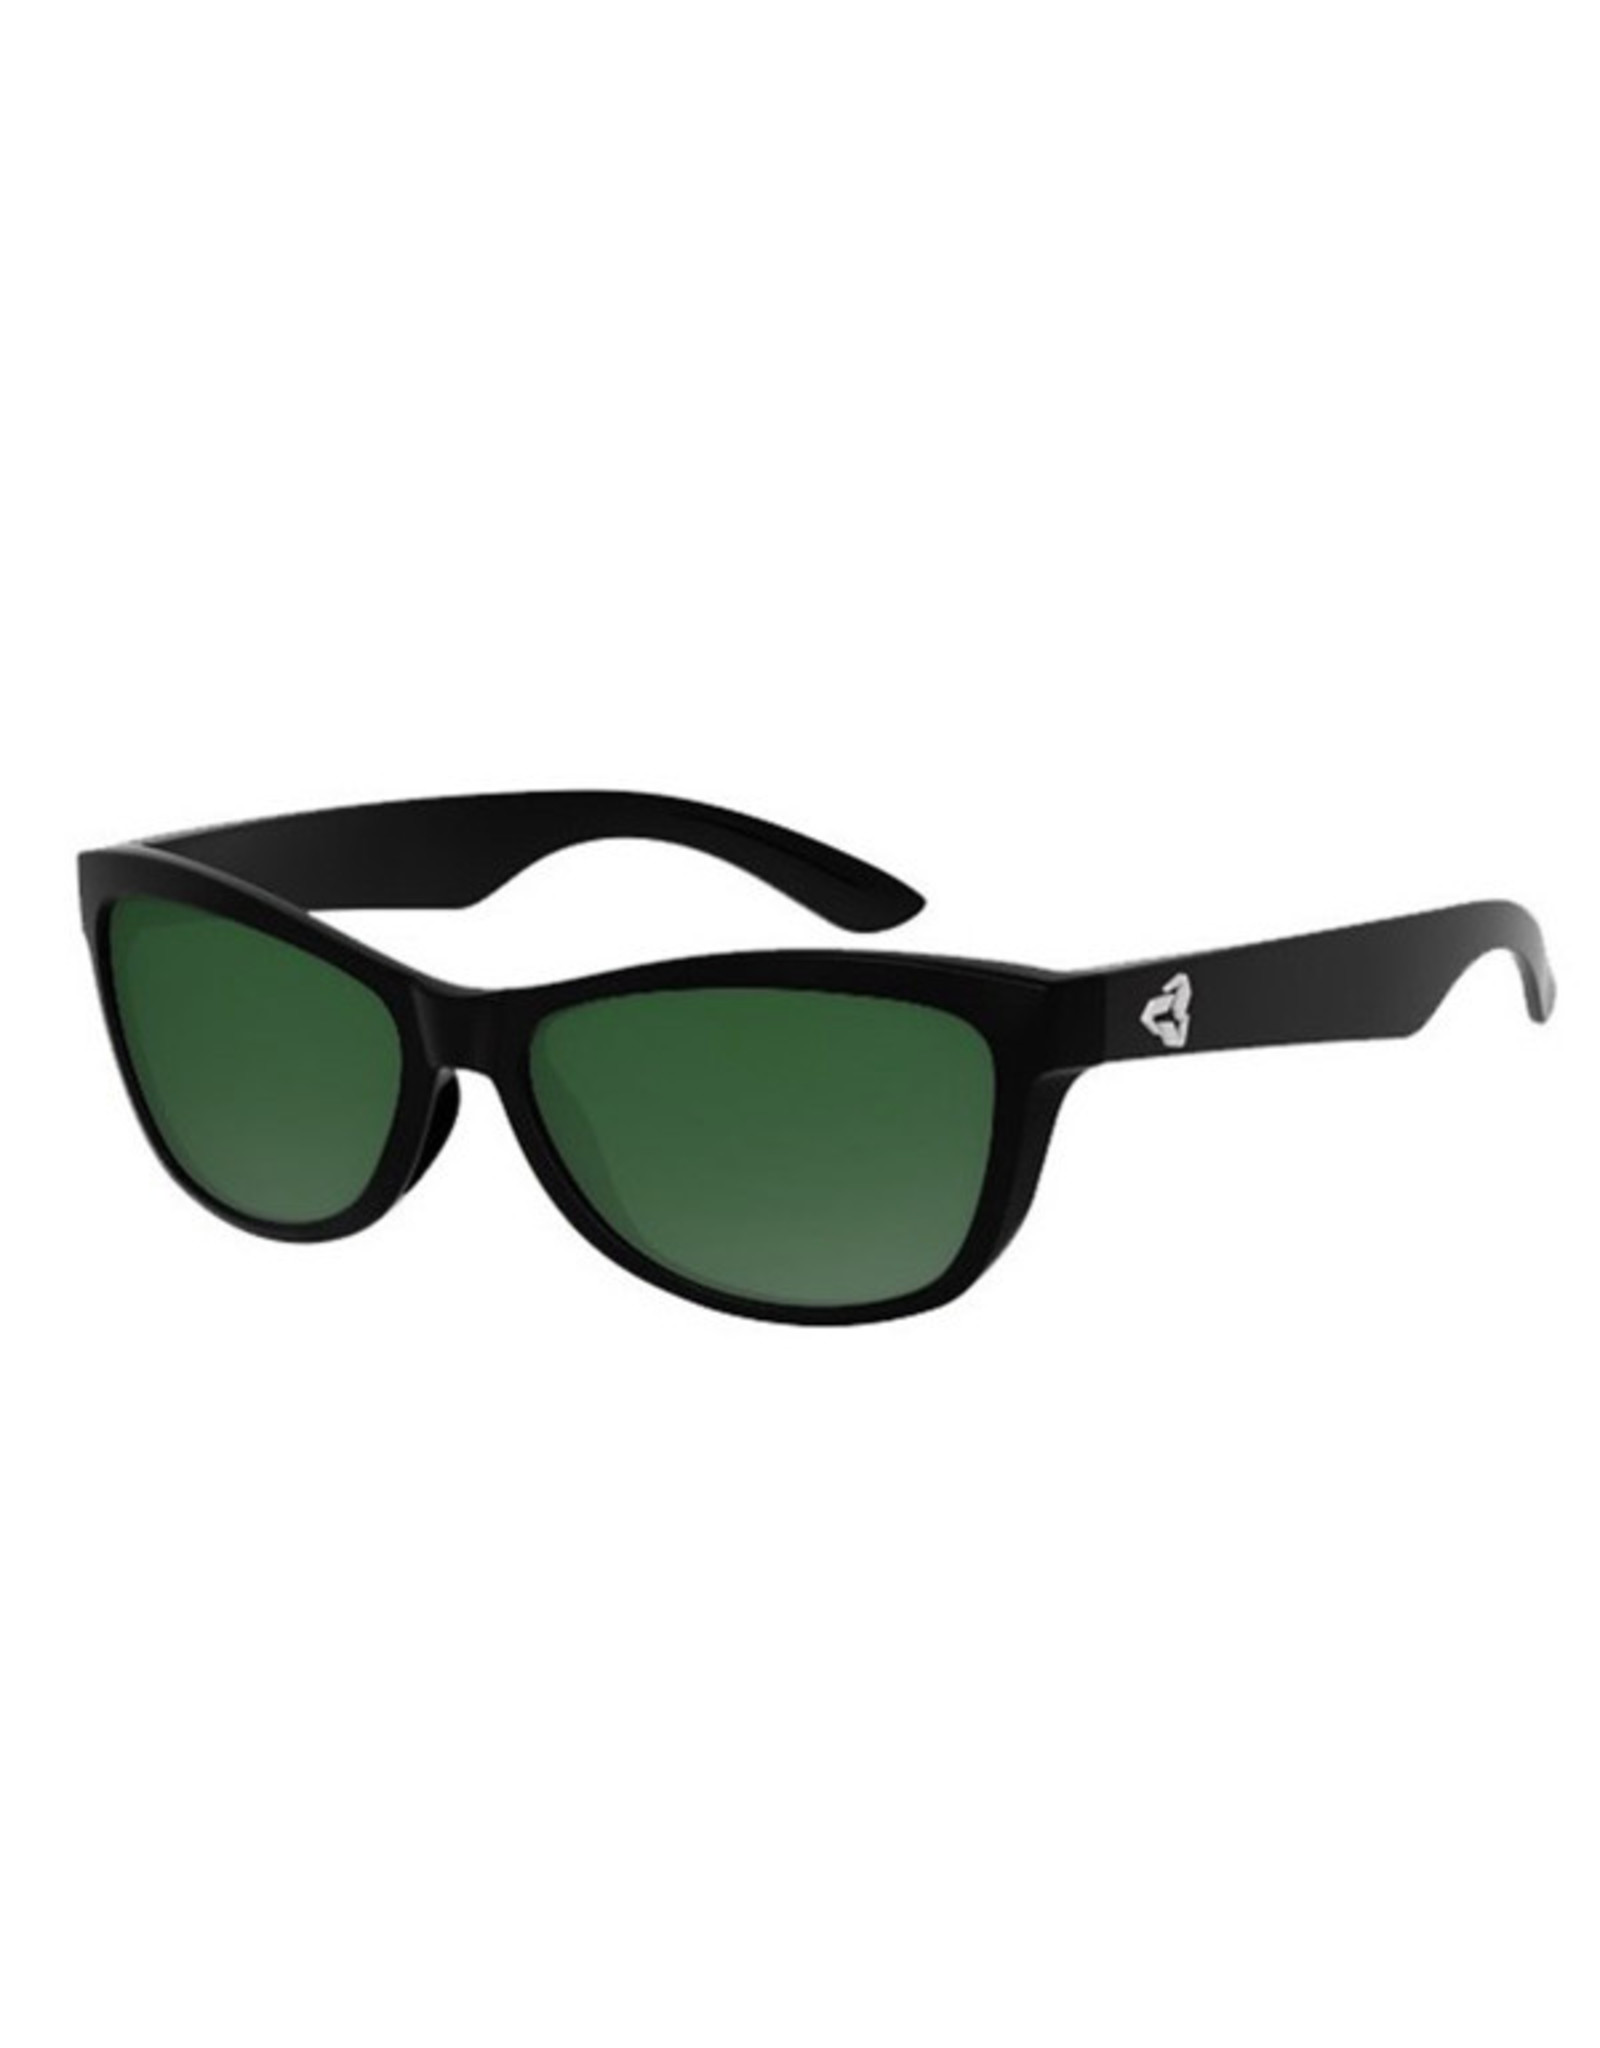 Ryders Eyewear - Gatto Poly Matte Black-Gloss Black-Xtal/Green Gradient Silver FM